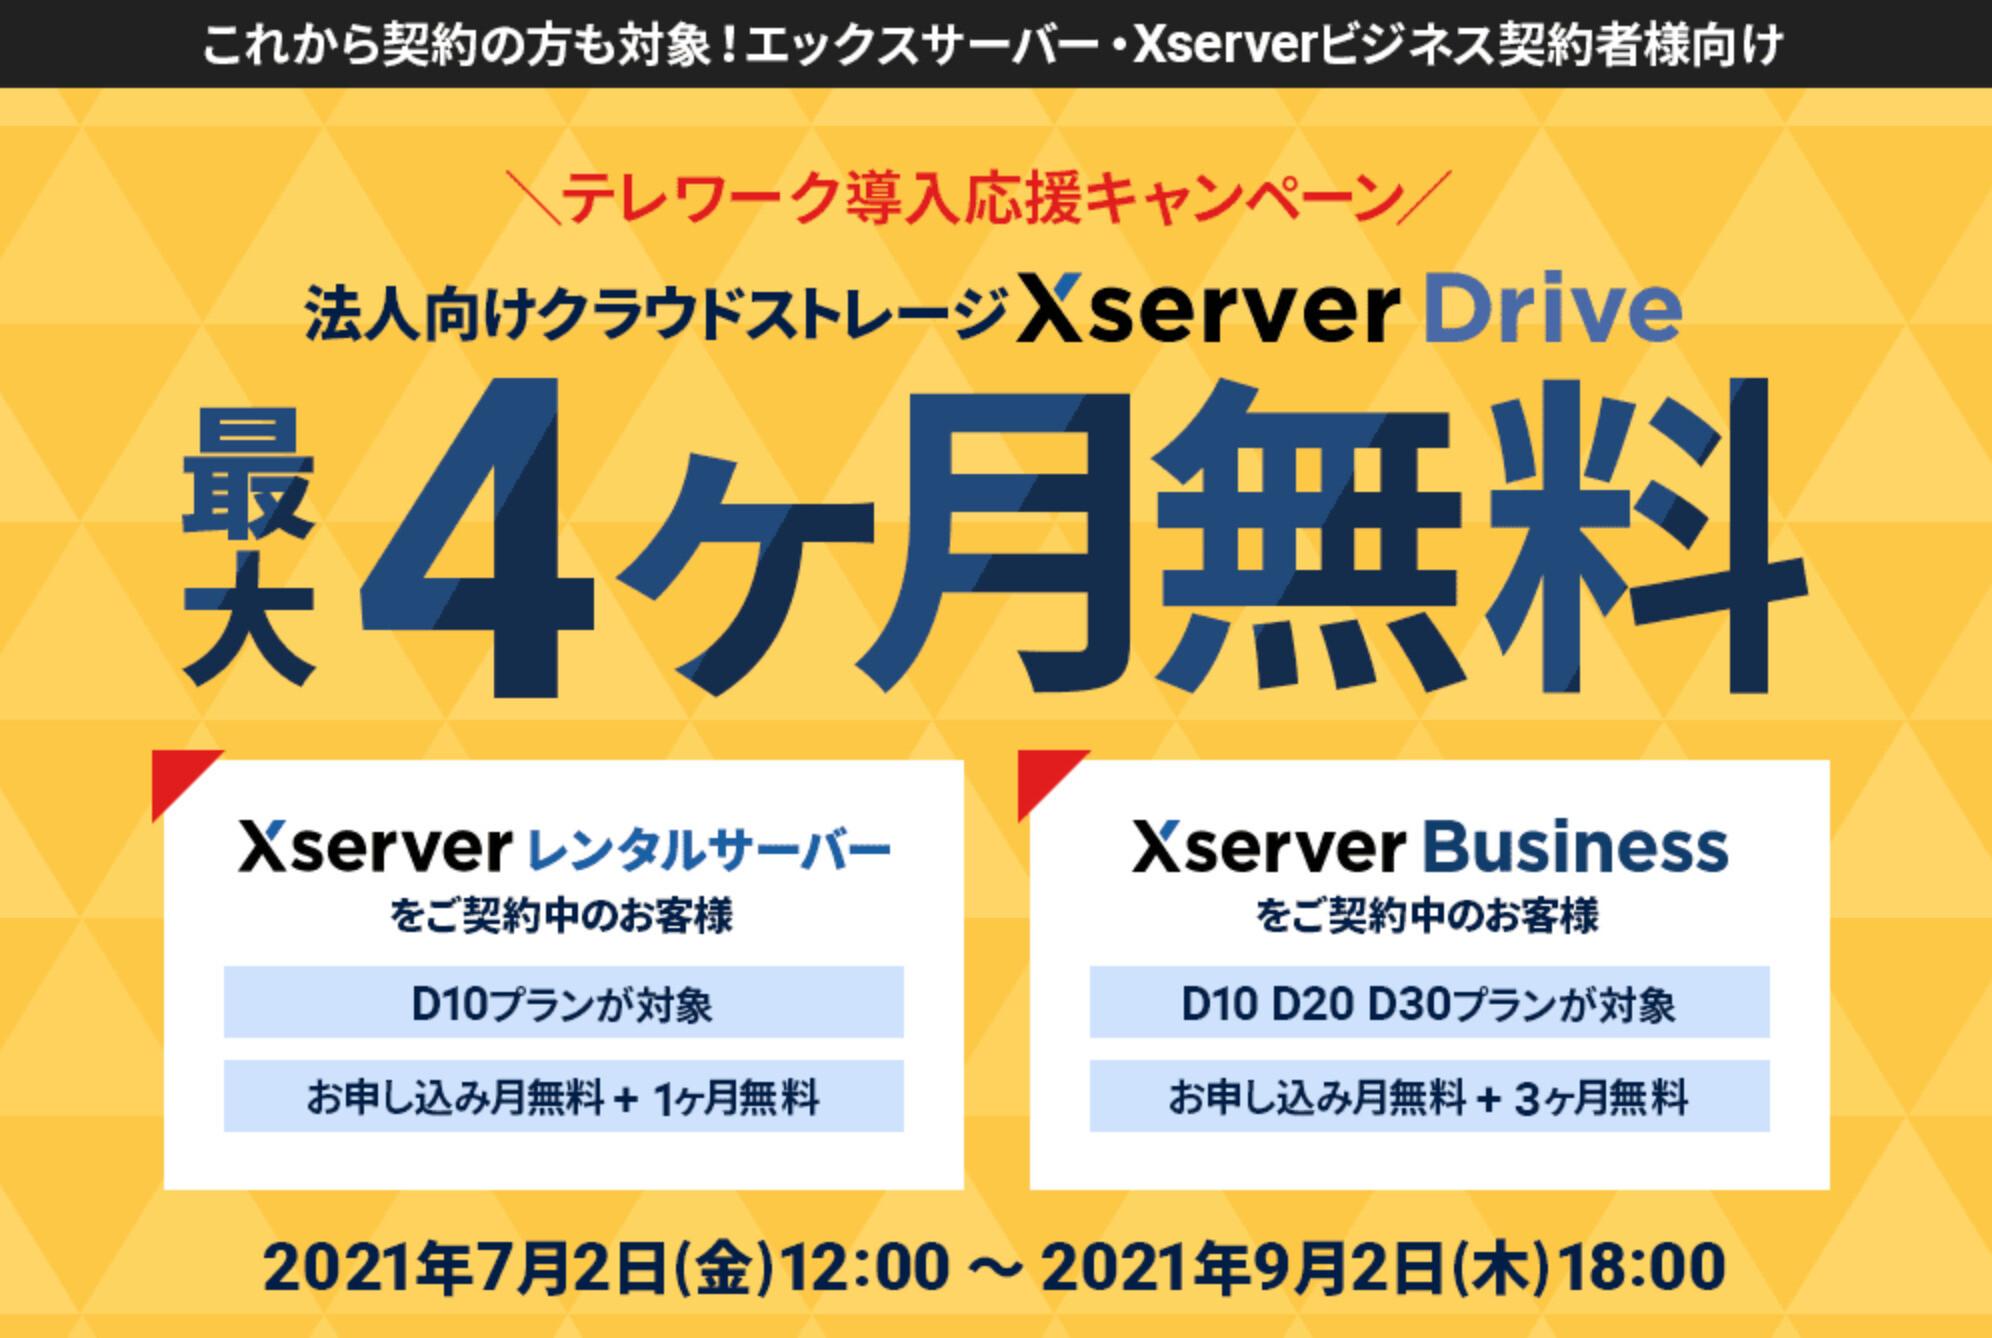 xserver-drive_trial